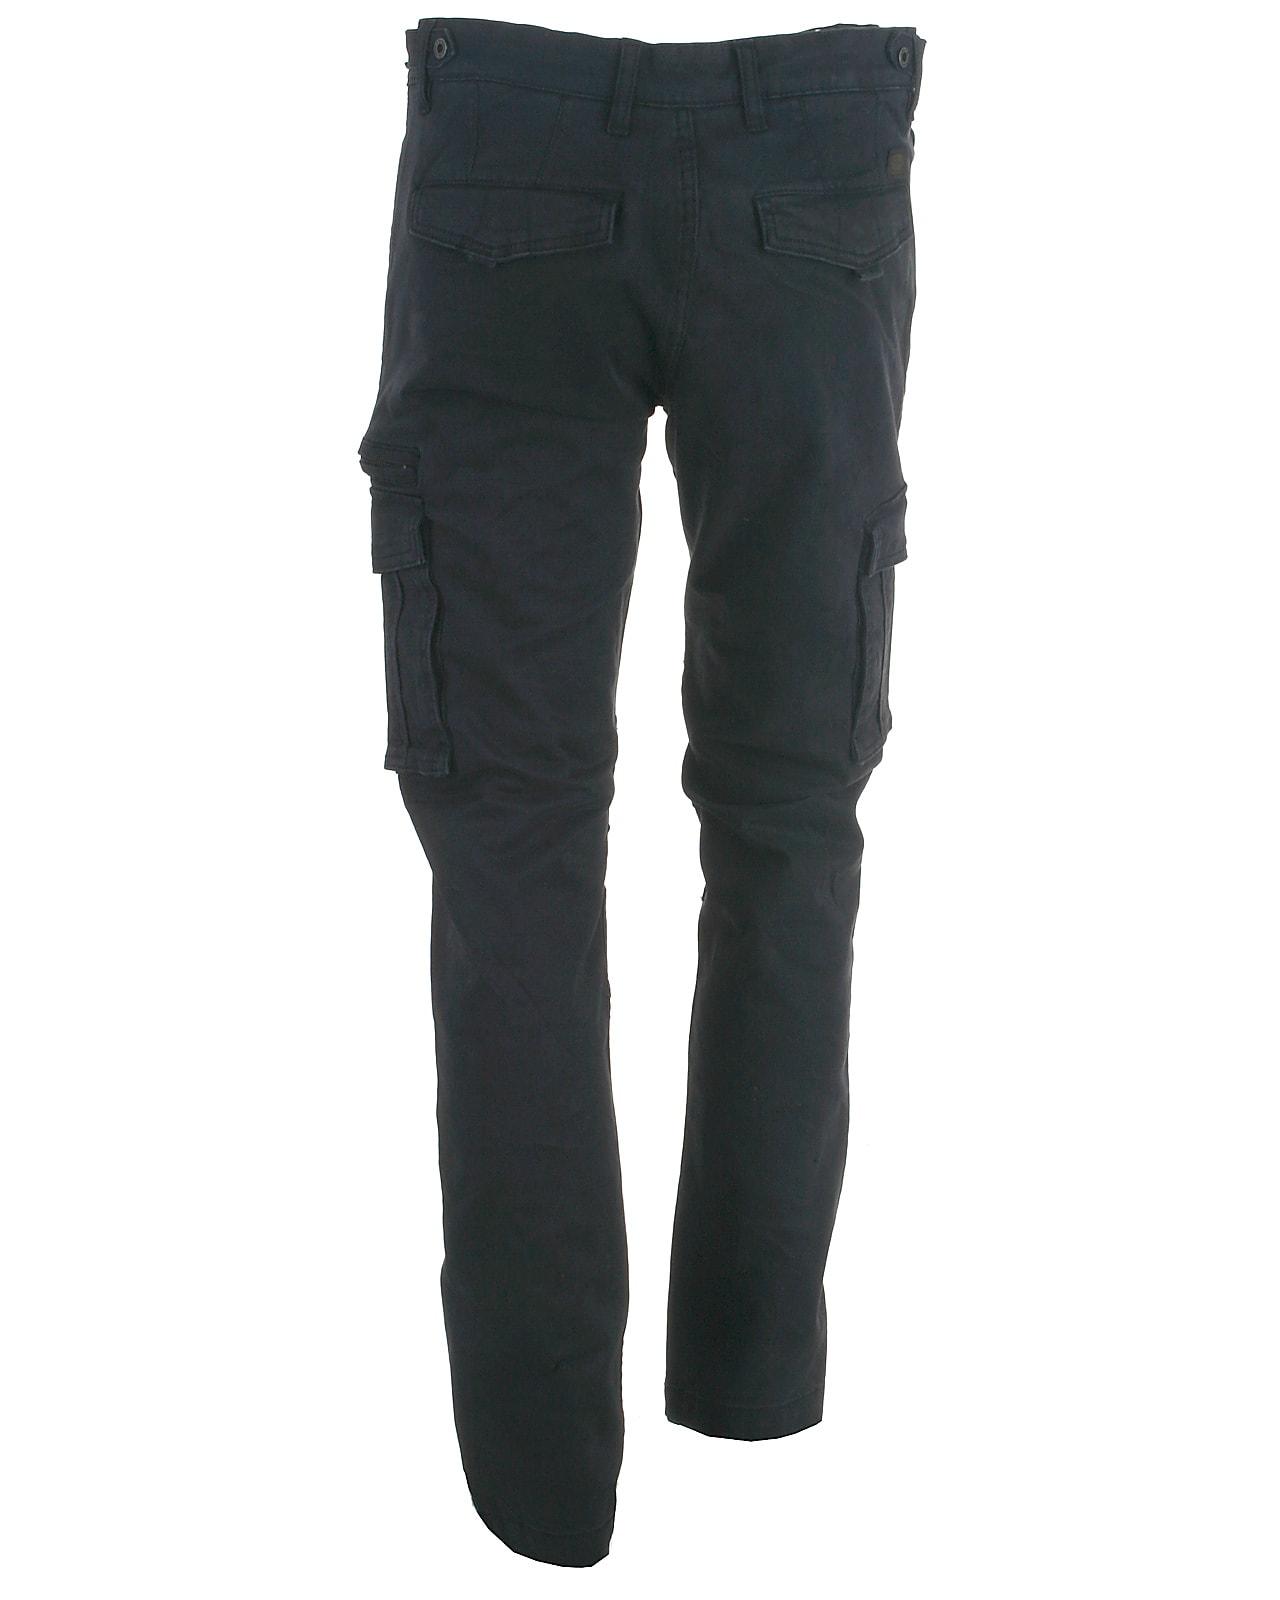 Image of Petrol cargo pants, darknavy